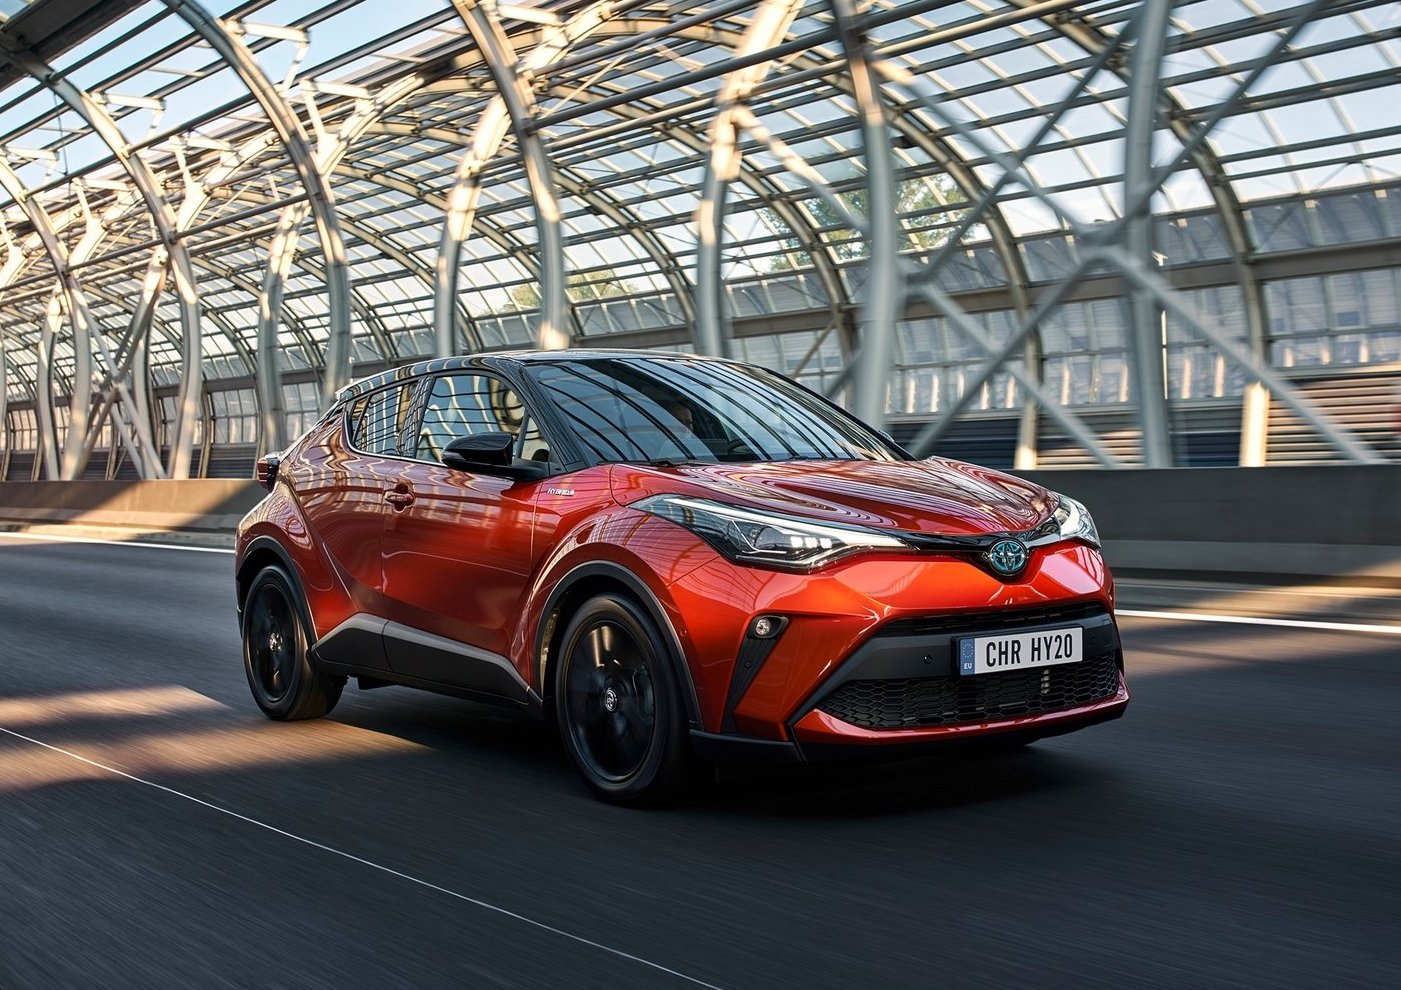 Toyota C-HR 2020 model details